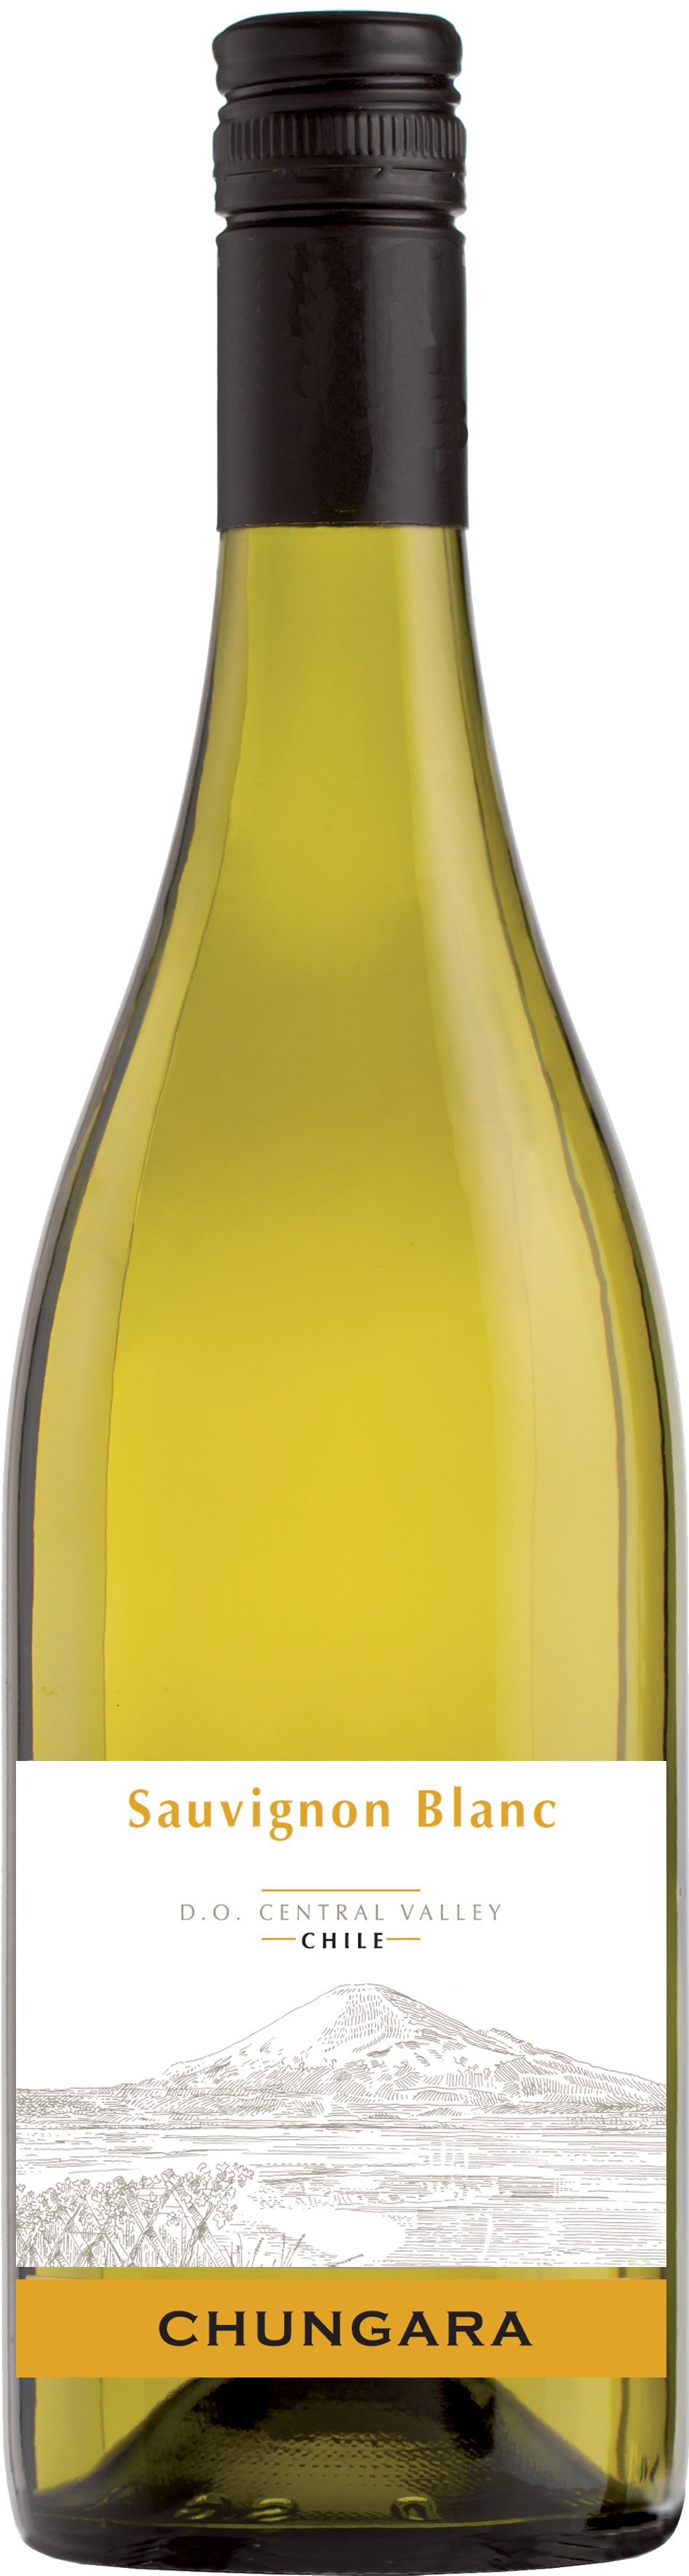 Chungara Sauvignon Blanc